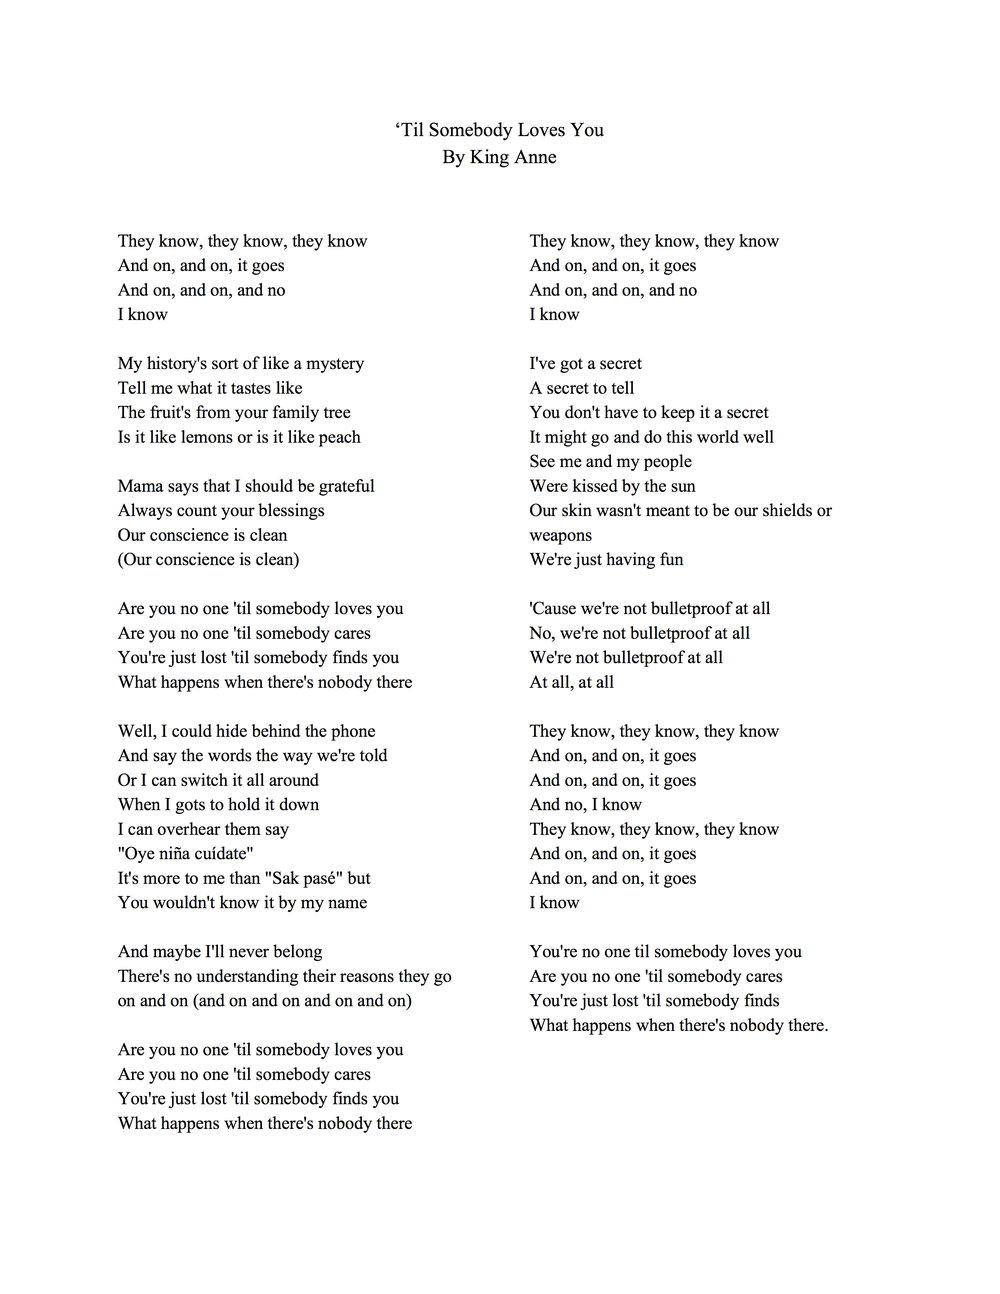 [SONG] 'Til Somebody Loves You by King Anne (1) copy.jpg